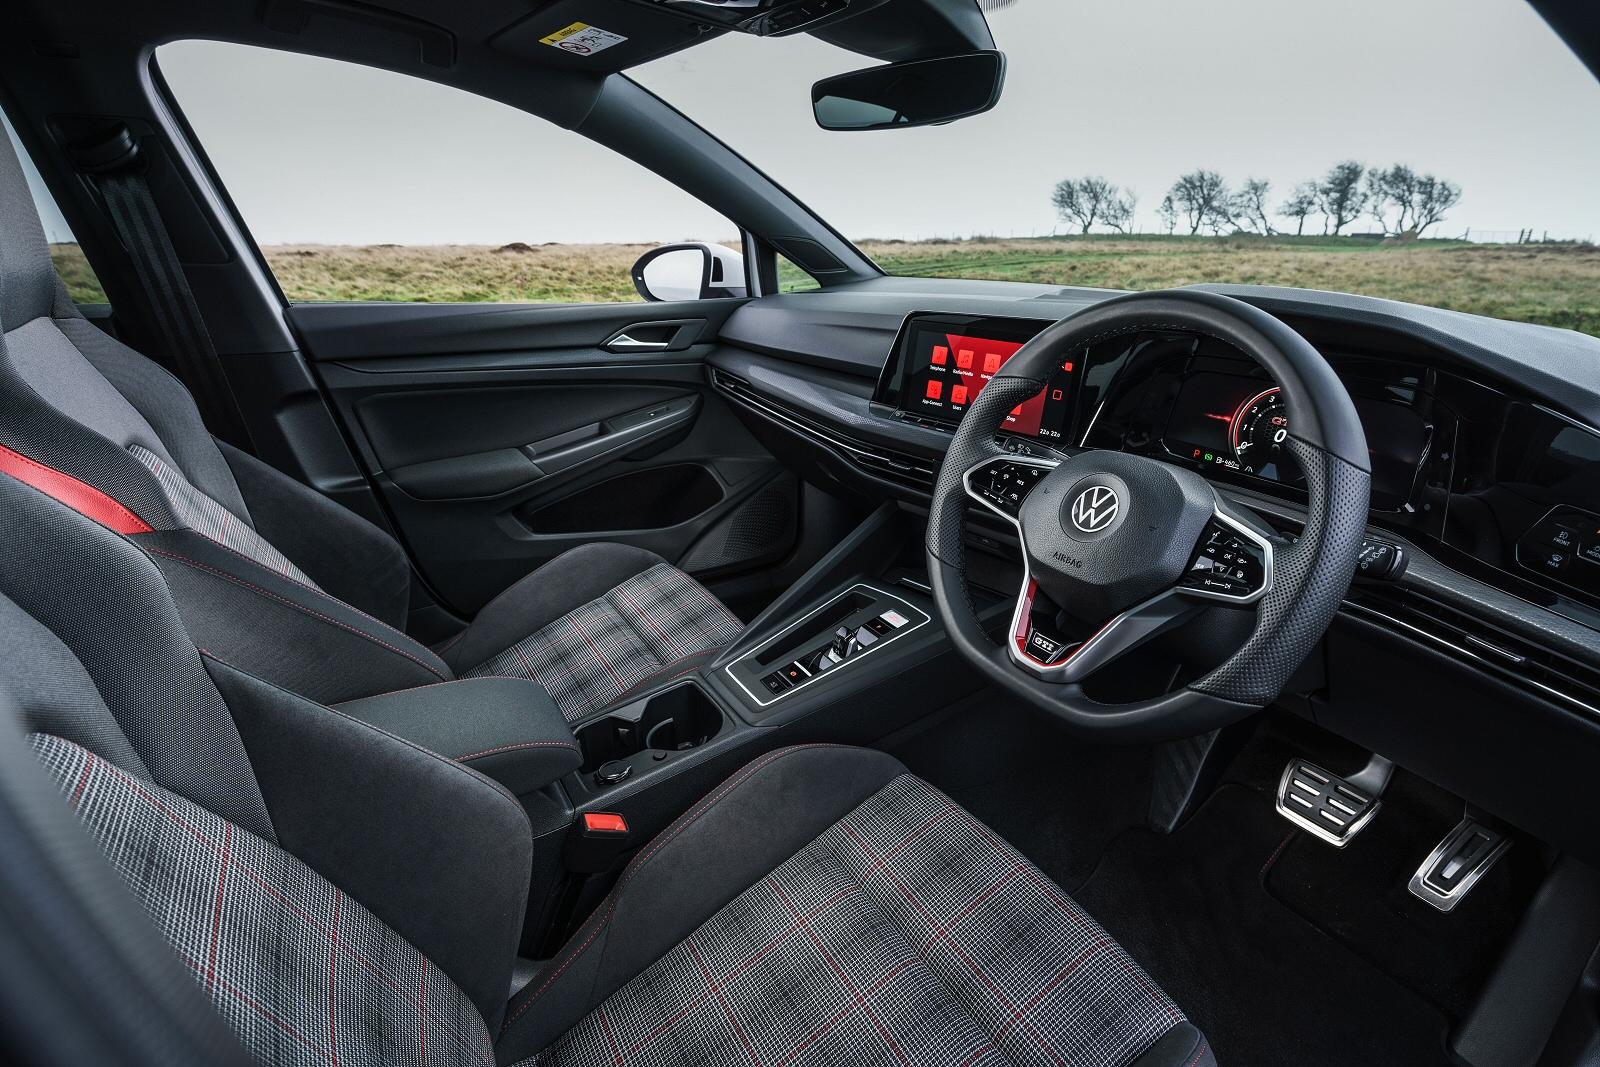 Volkswagen Golf 8 GTI 2.0 TSI 245PS 7-speed DSG 5 Dr + 19inch ALLOYS/DCC/WINTER PACK